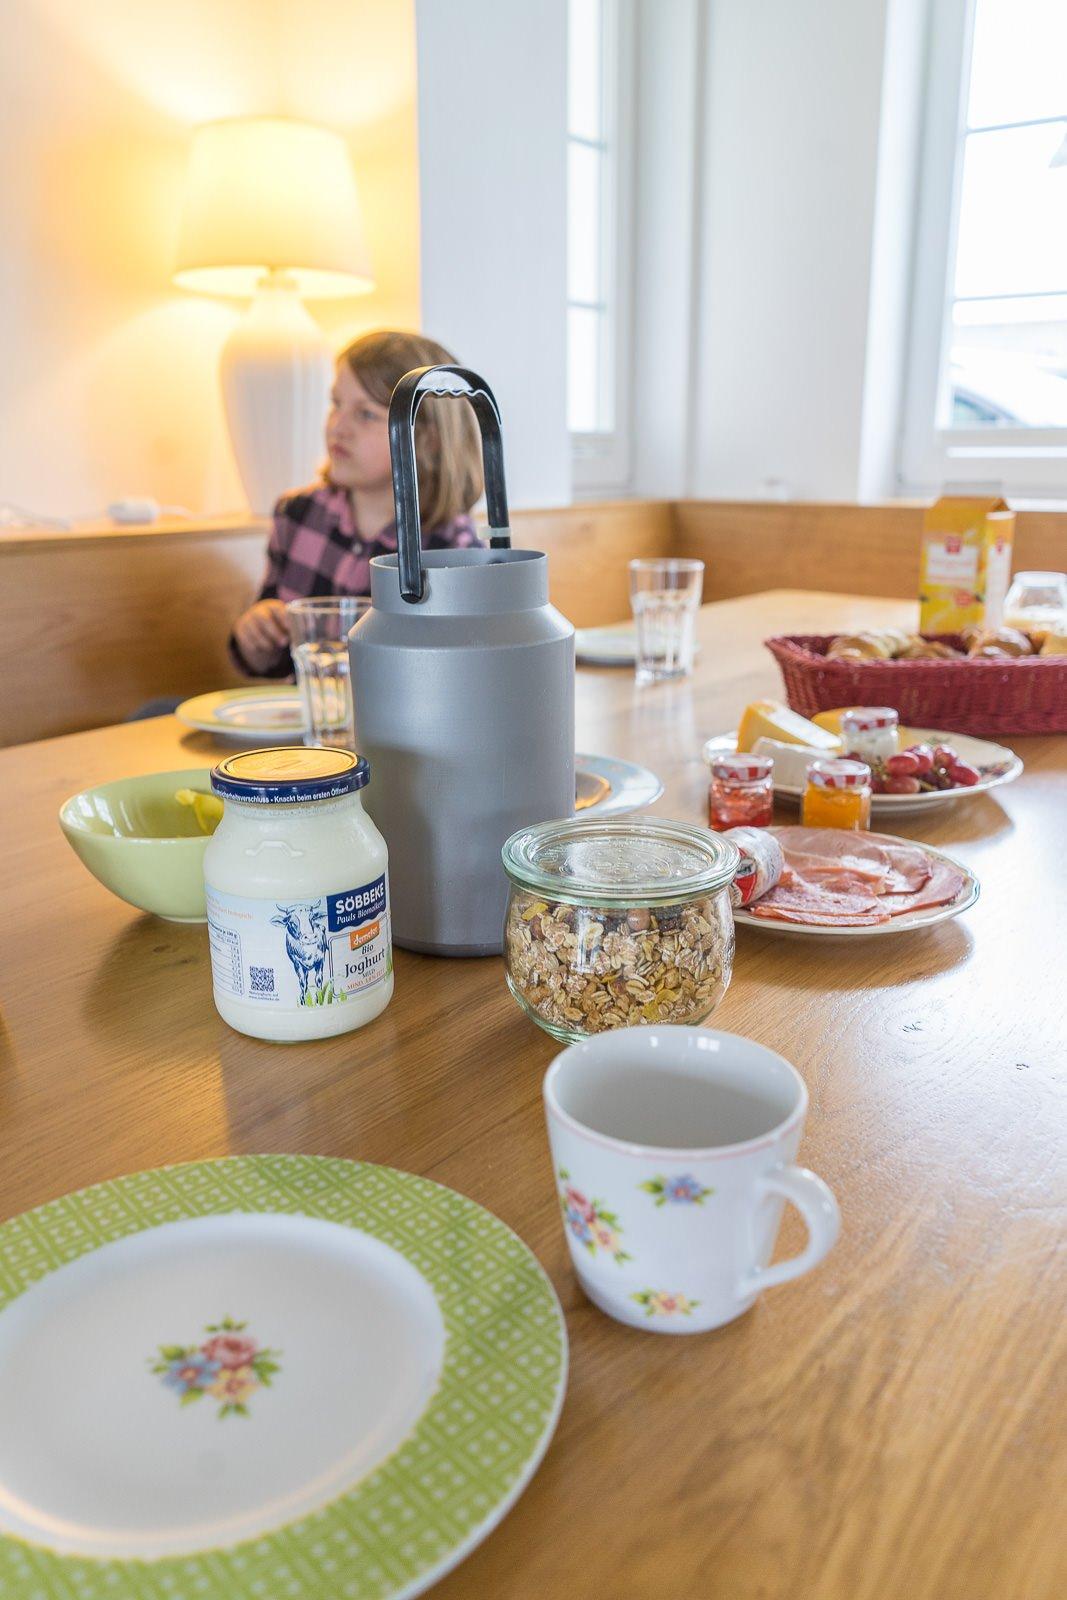 hof könne Bauernhofurlaub frühstück